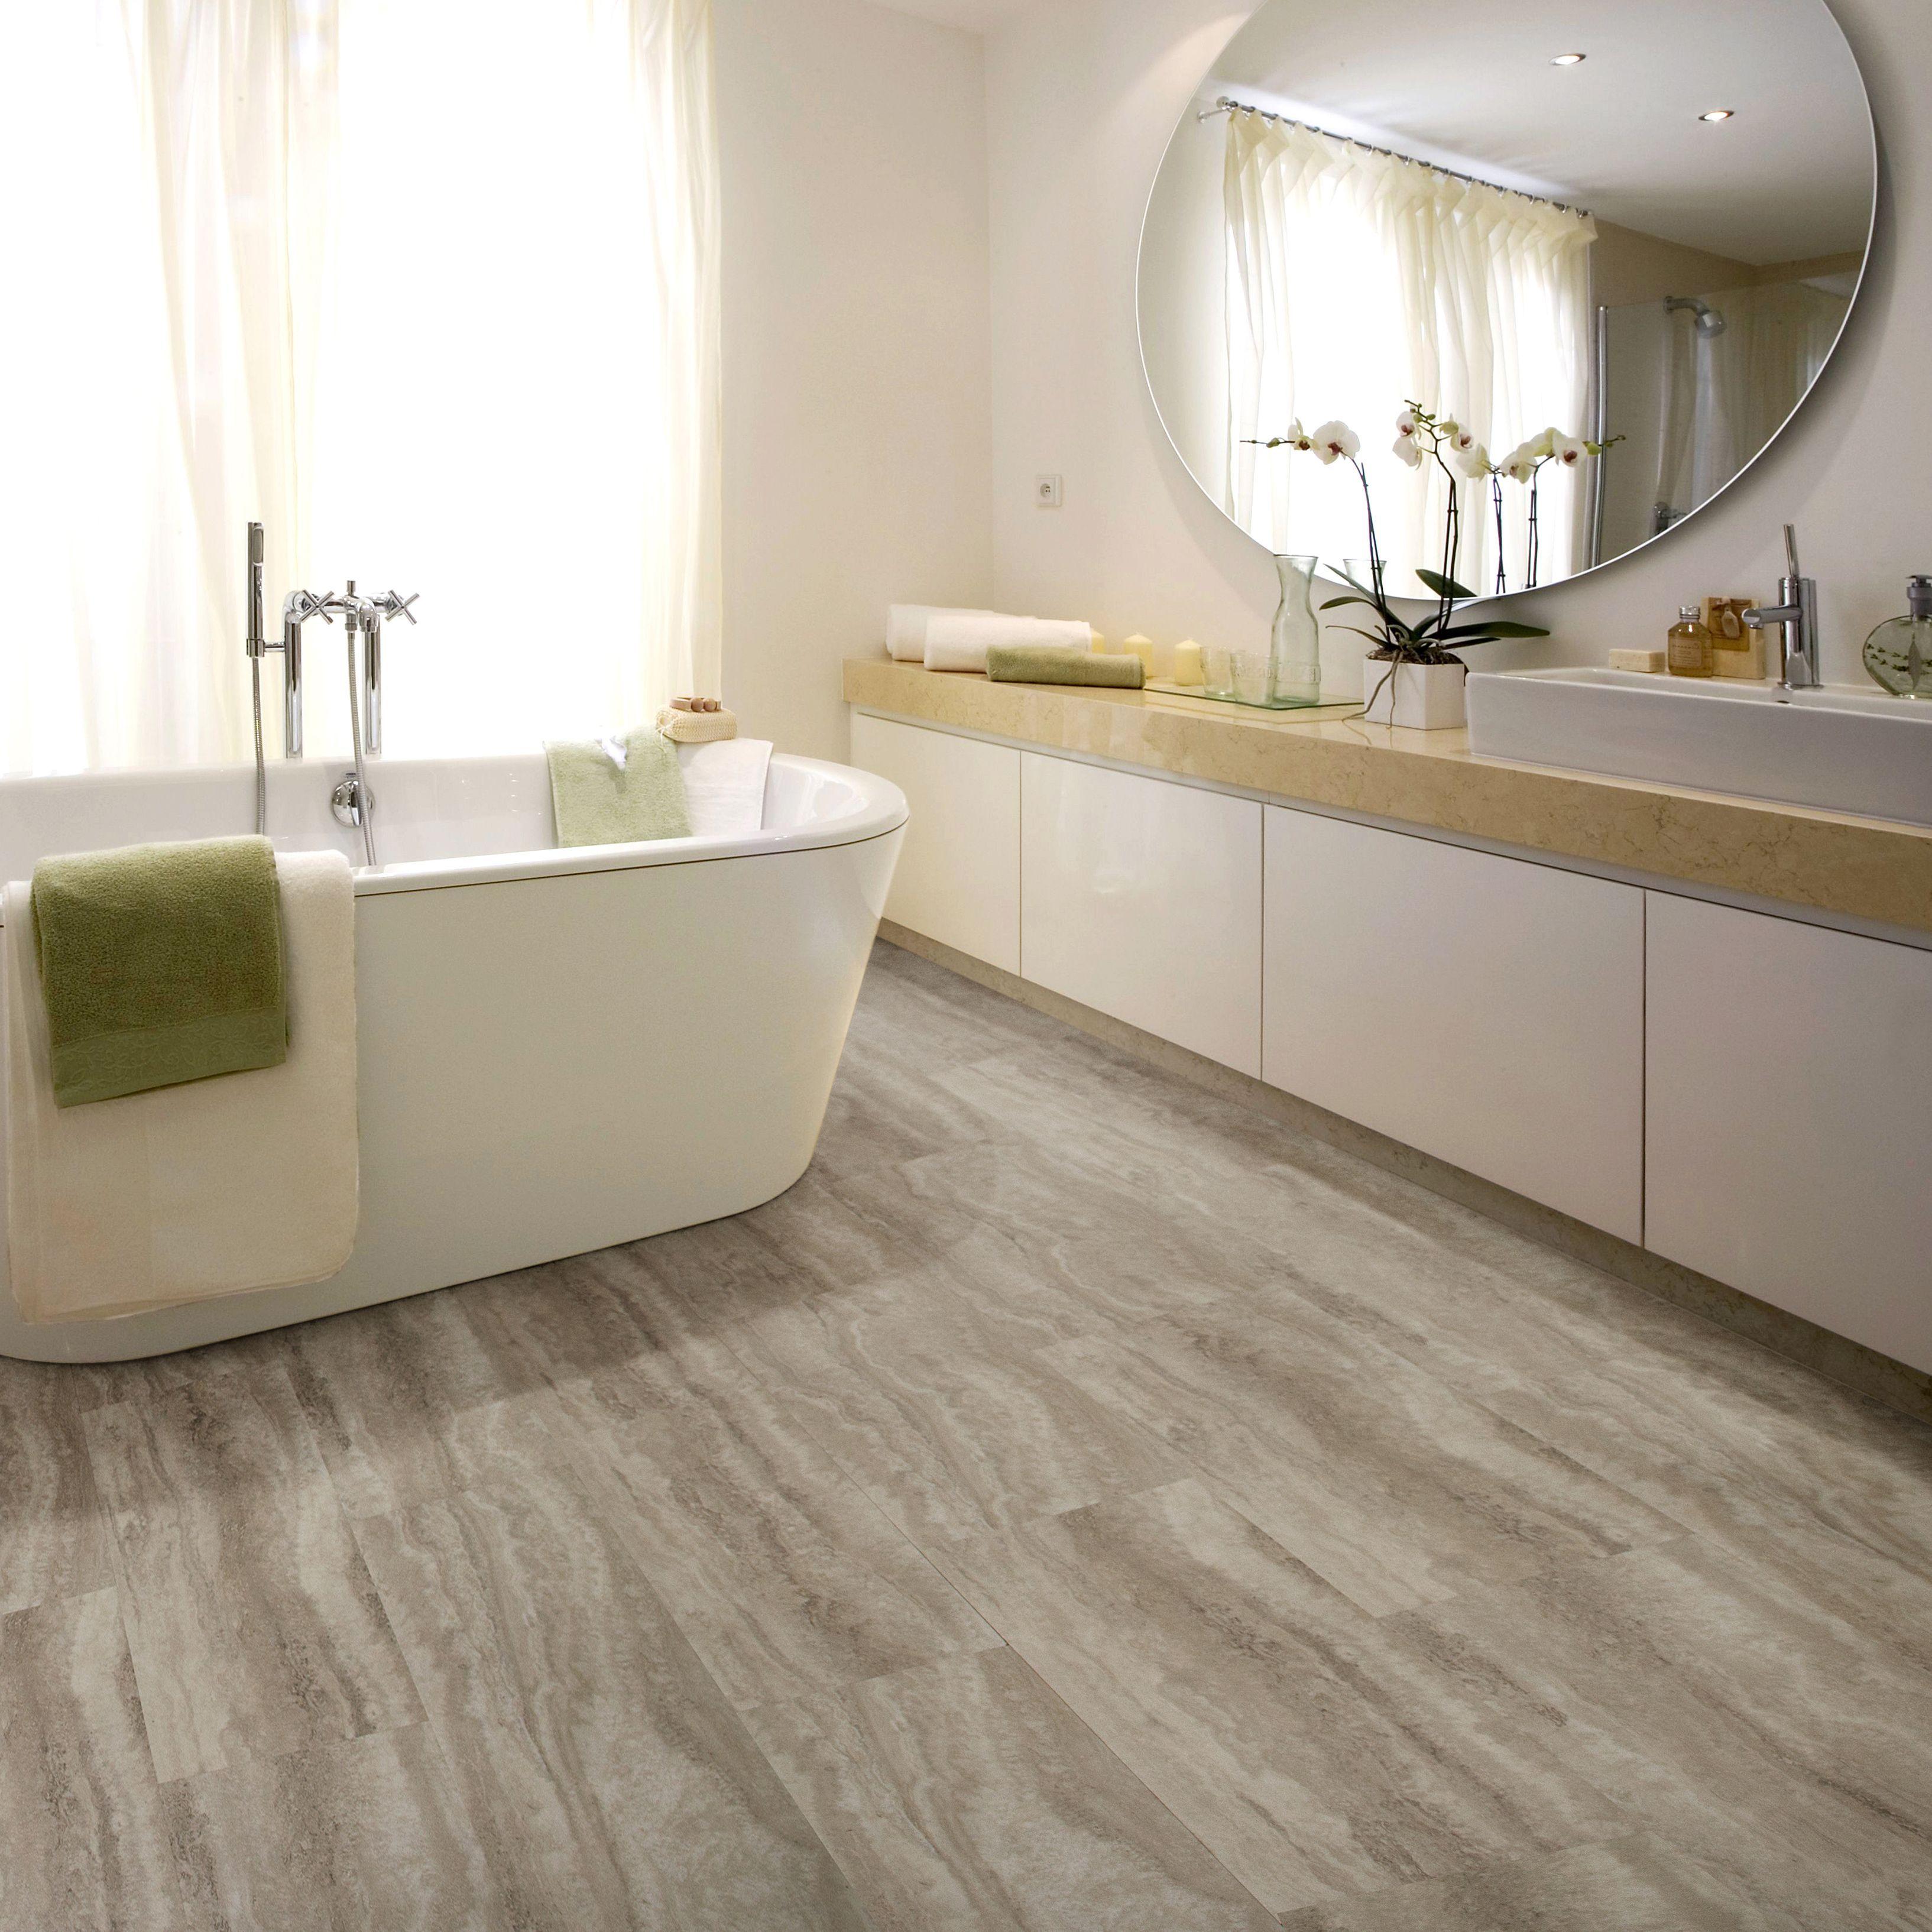 Plank tile flooring bathroom